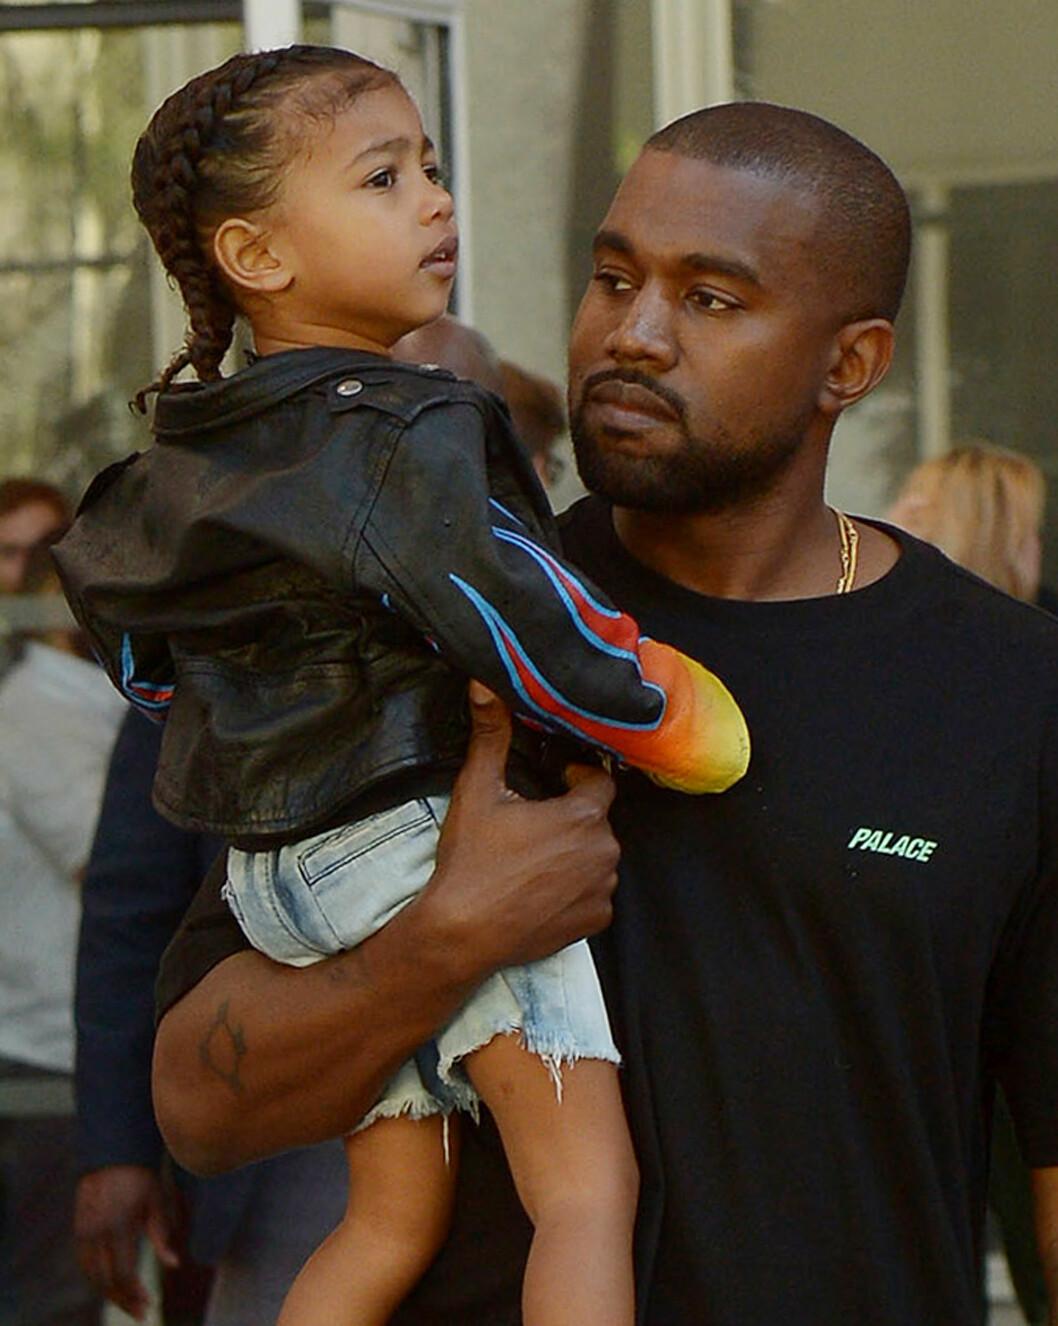 PAPPAJENTE: I desember ble Kanye West tobarnsfaren, da sønnen Saint kom til verden. Her er han sammen med sin søte datter North.  Foto: Broadimage